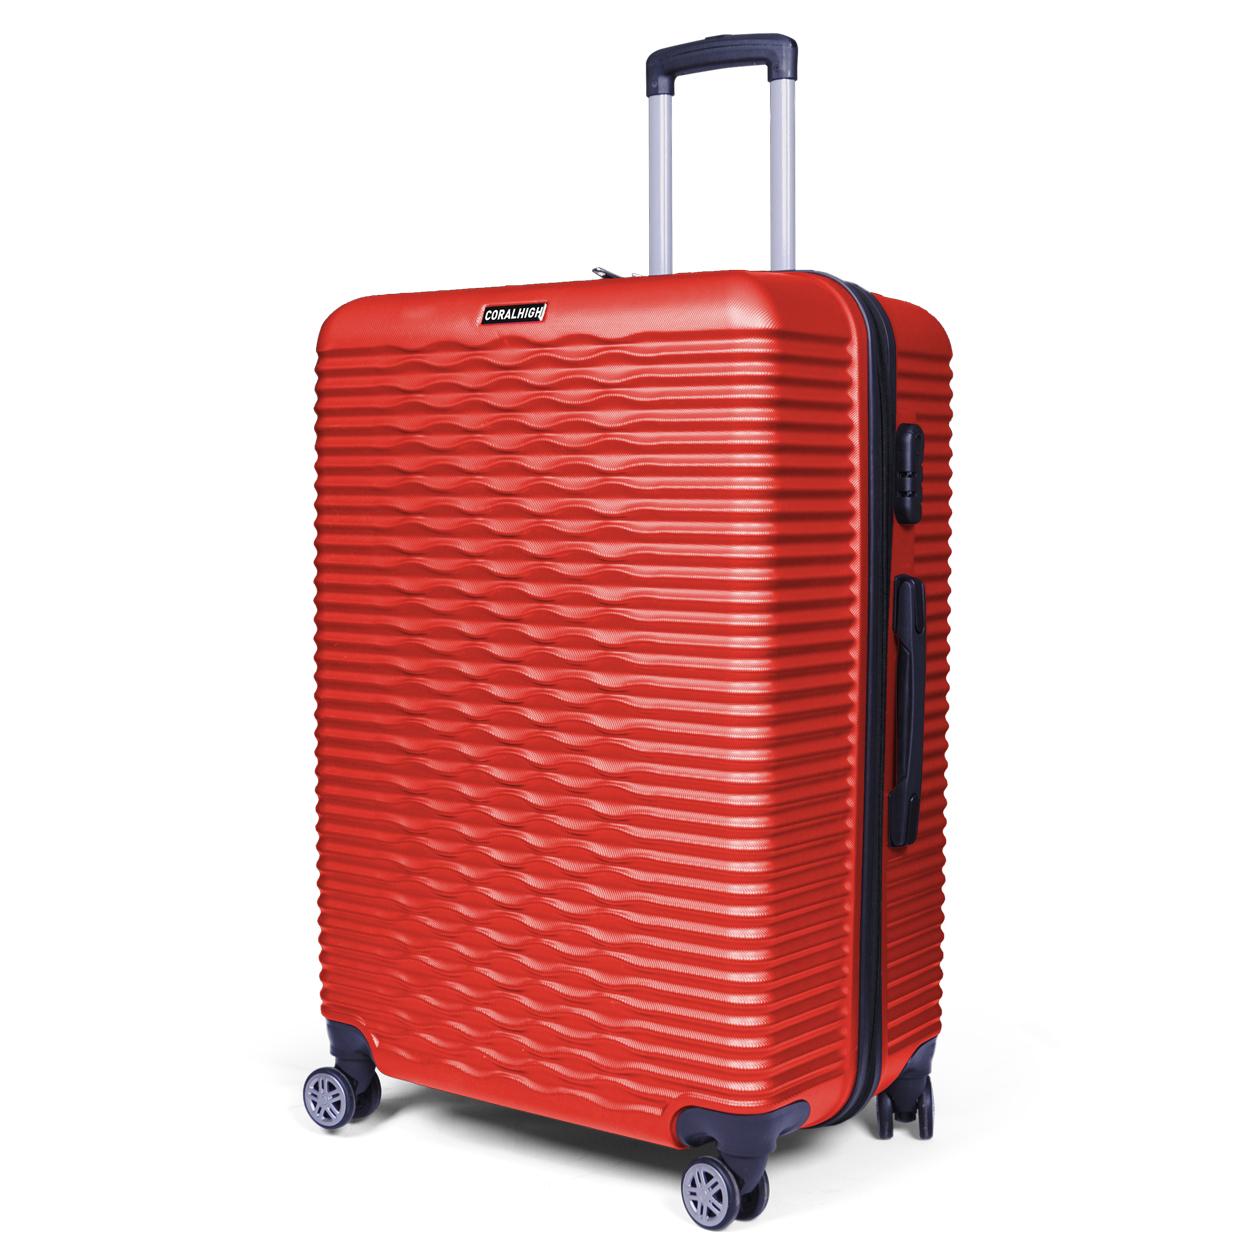 Coral High - Coral High Kırmızı Büyük Boy 70 cm Litre Seyahat Valizi